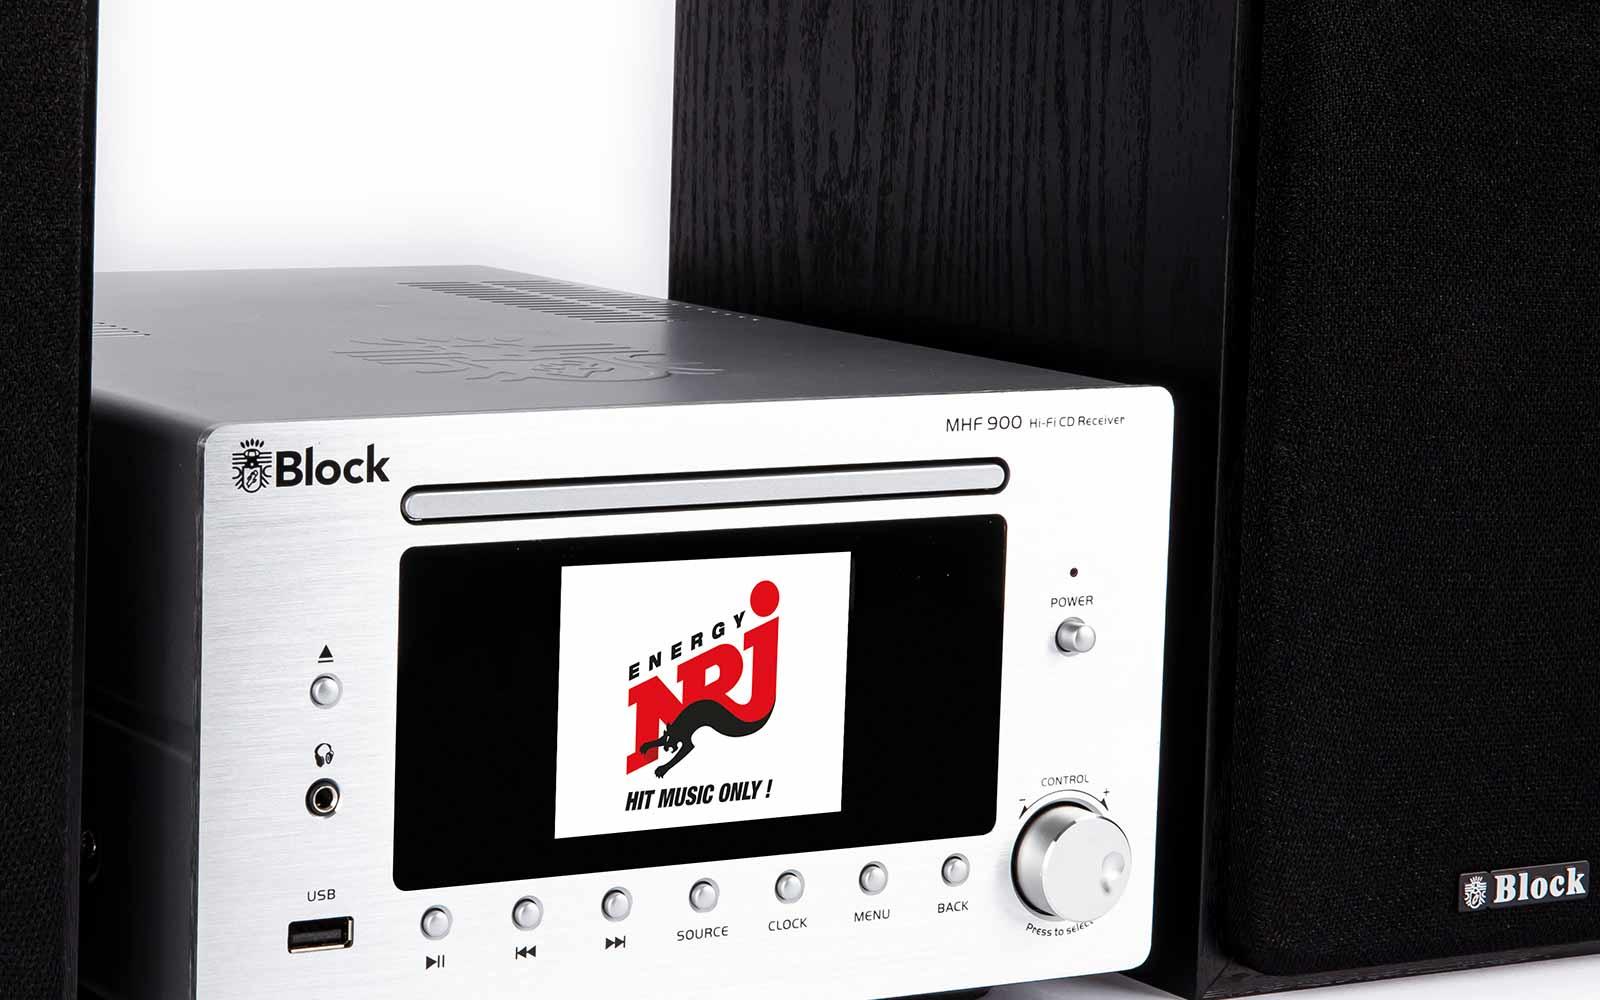 Block MHF-900